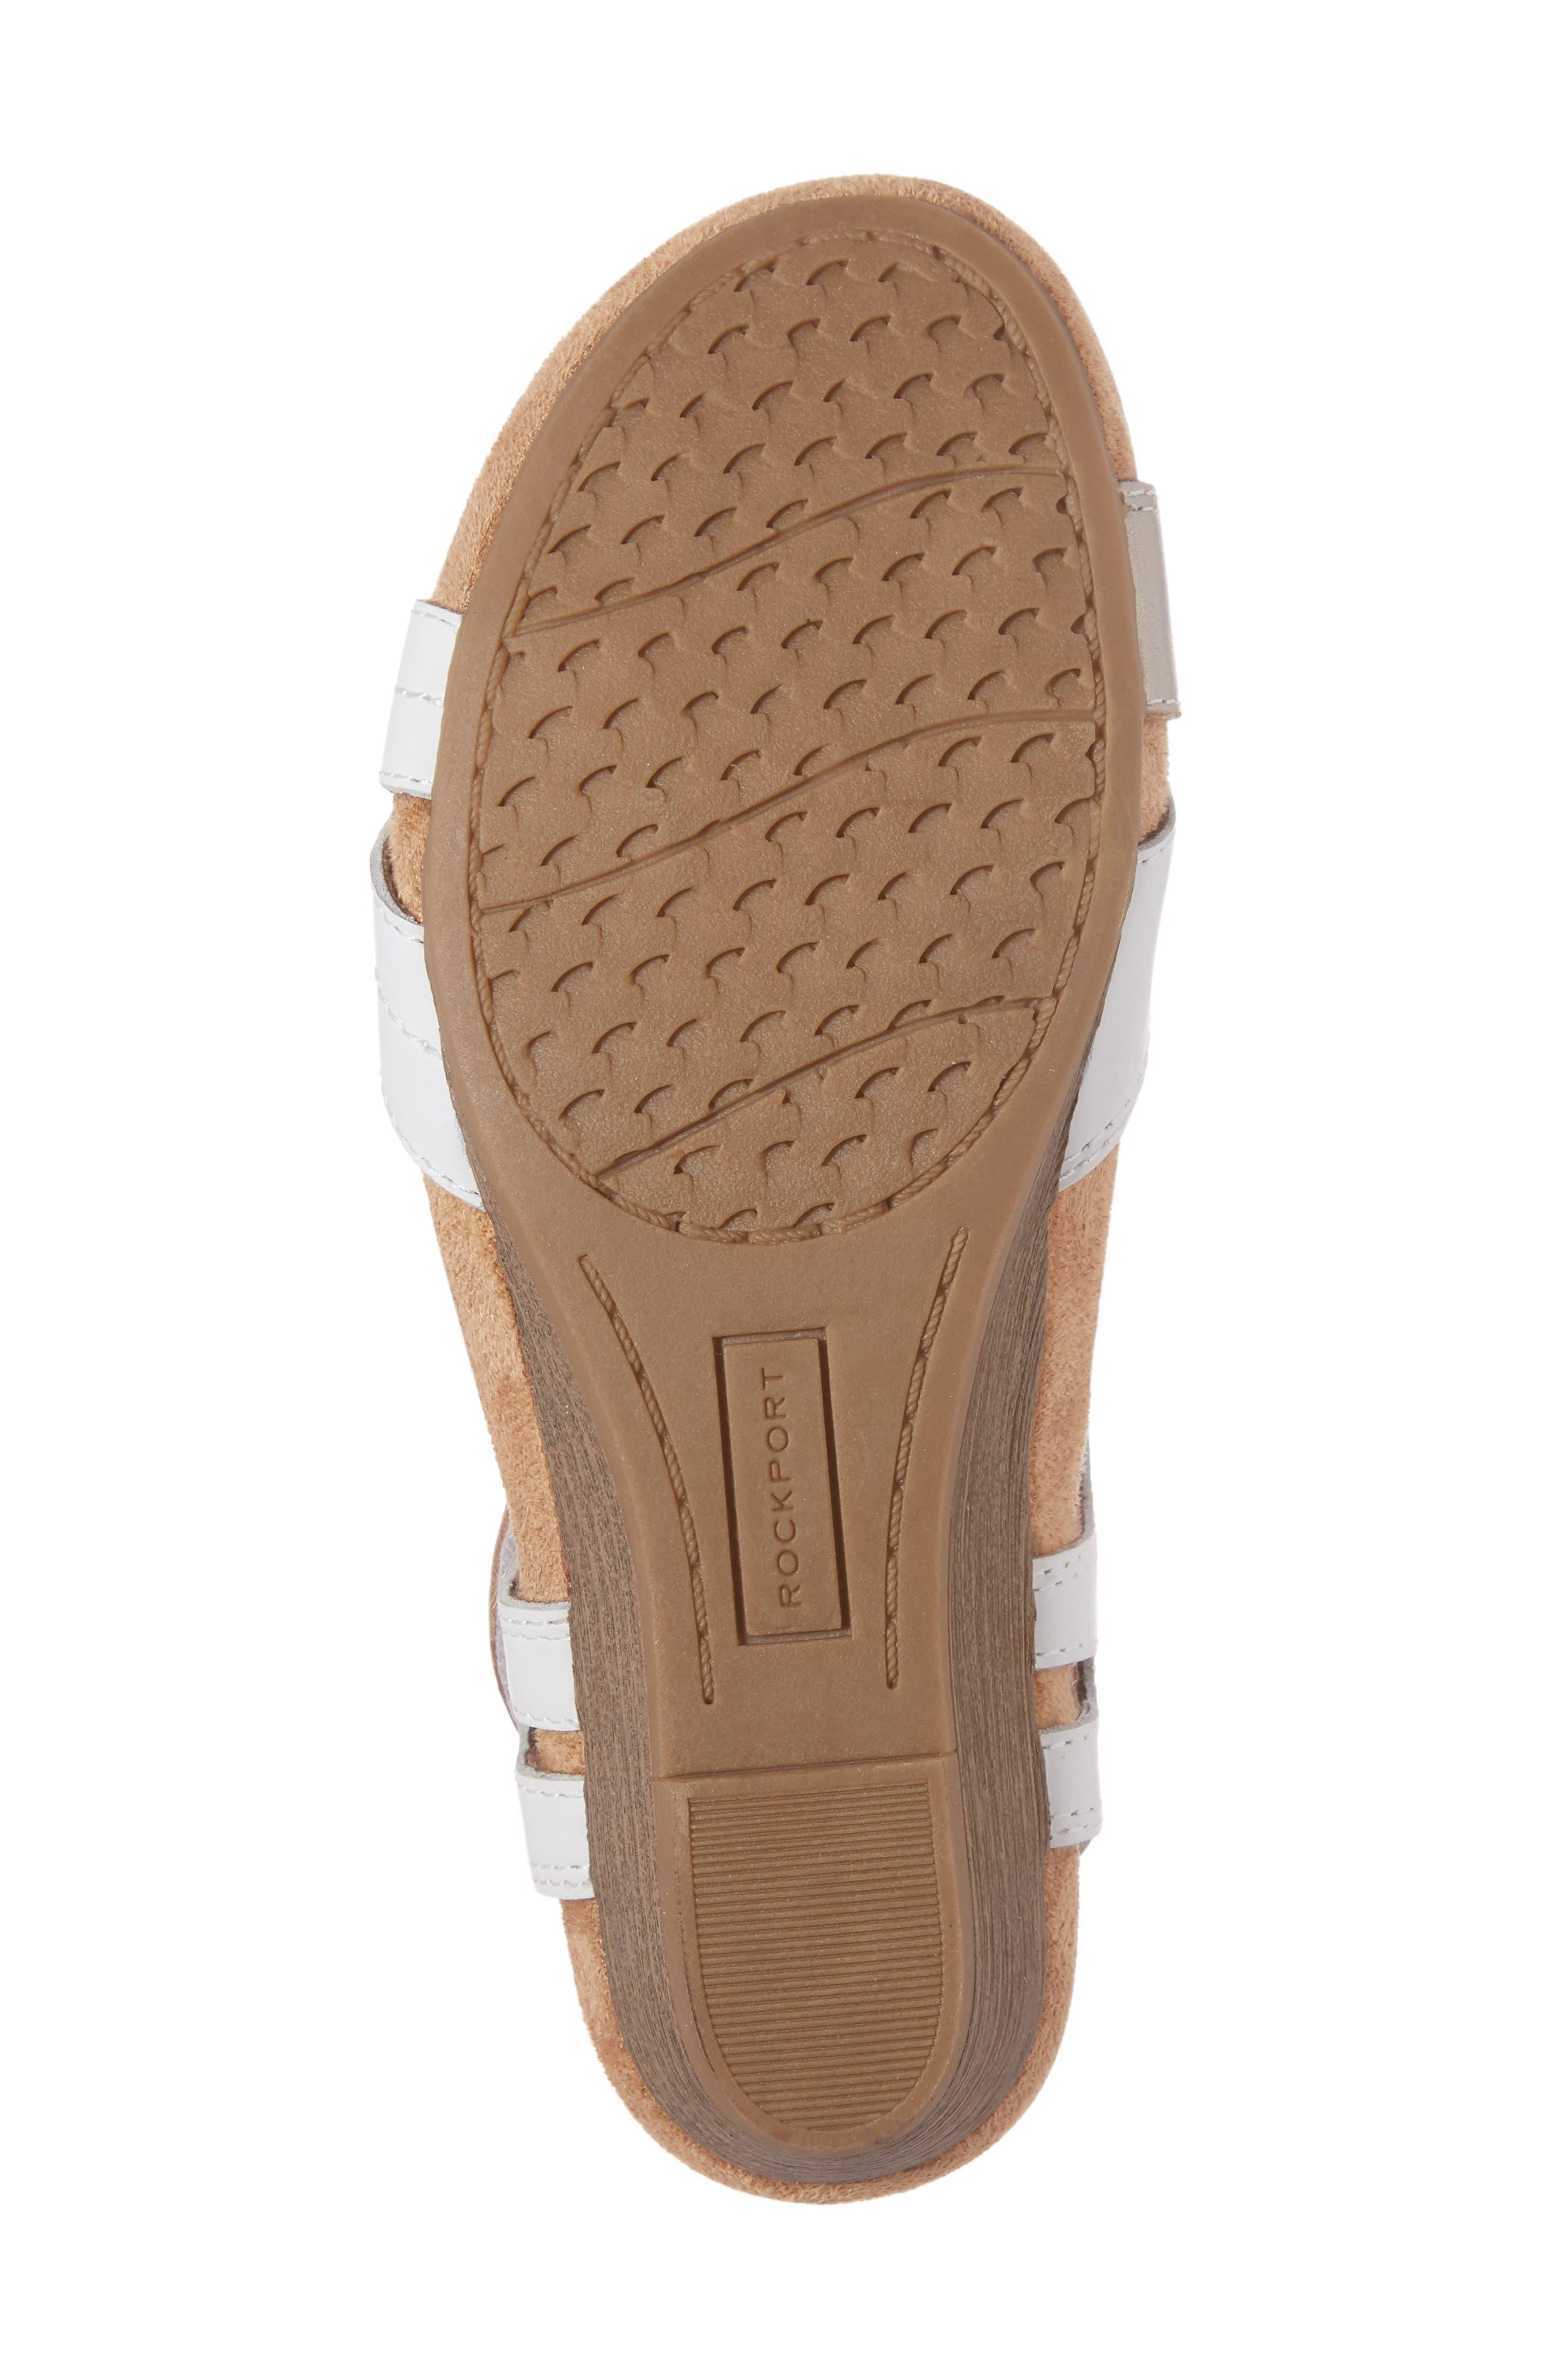 Hollywood Wedge Sandal,                             Alternate thumbnail 6, color,                             White Leather